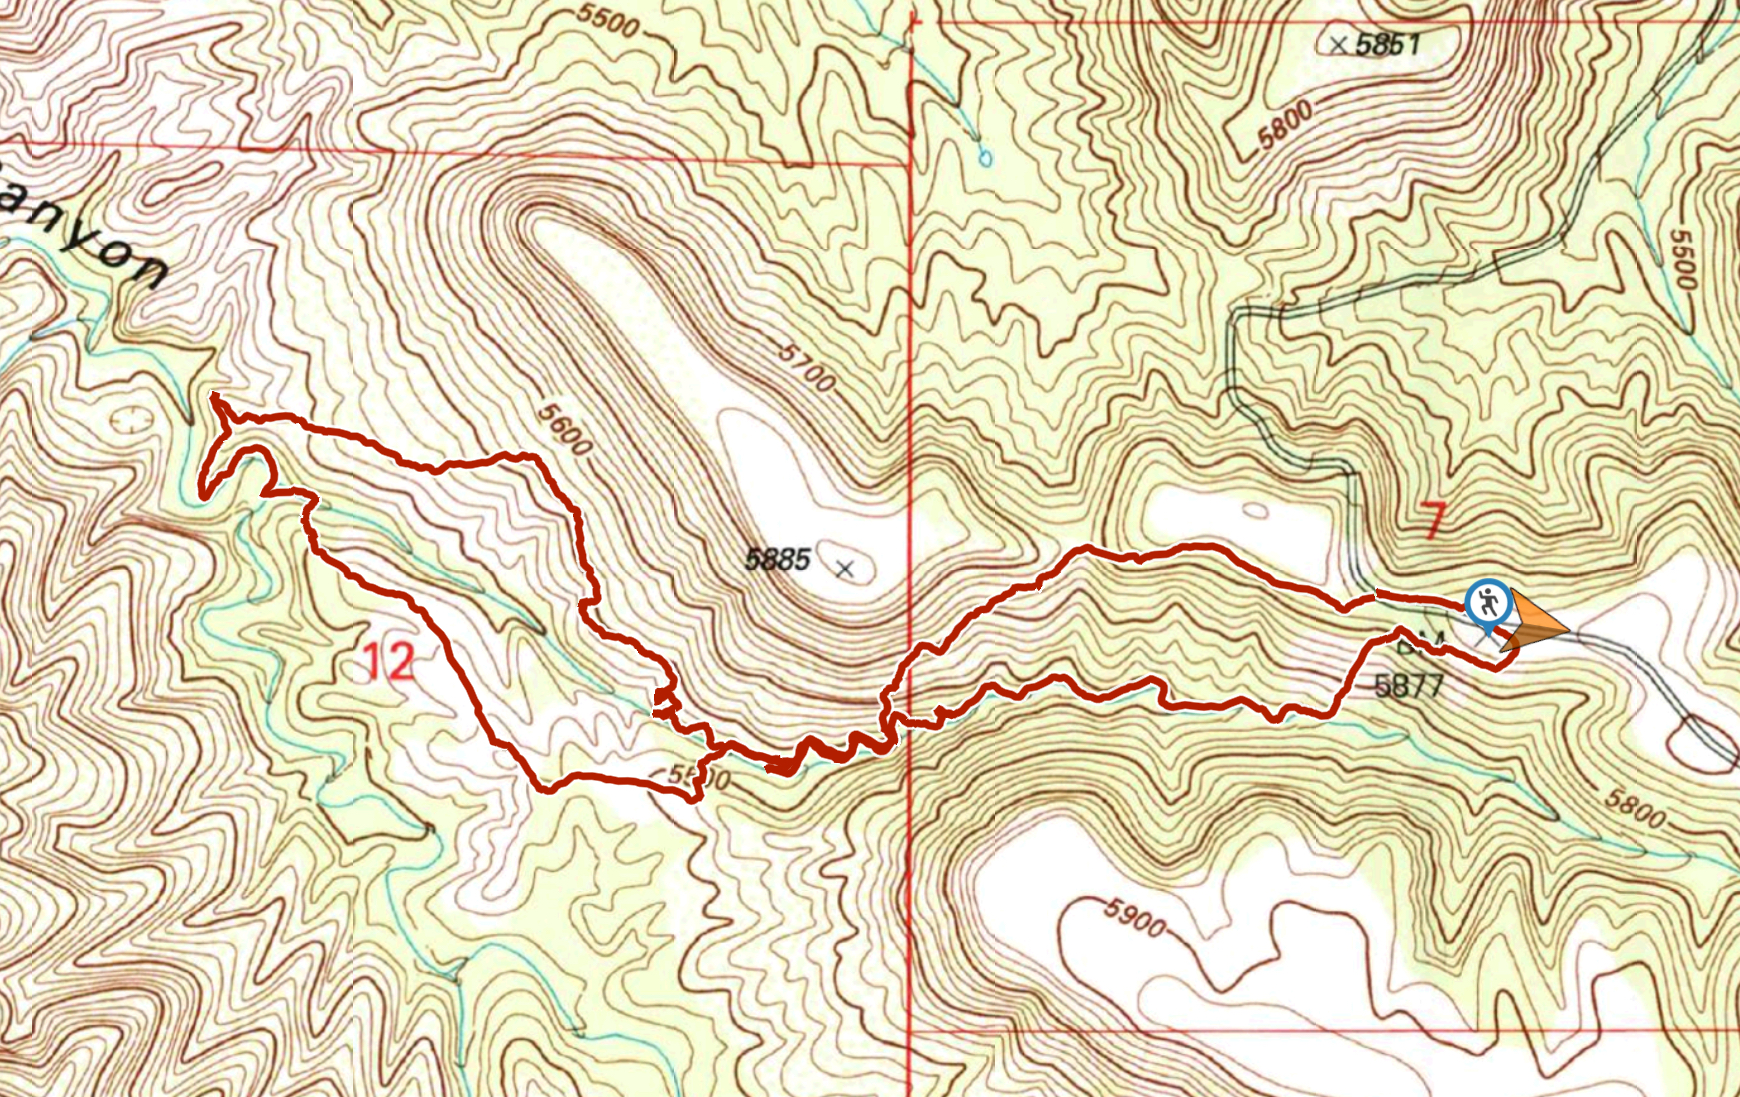 distant view of the pinos altos range